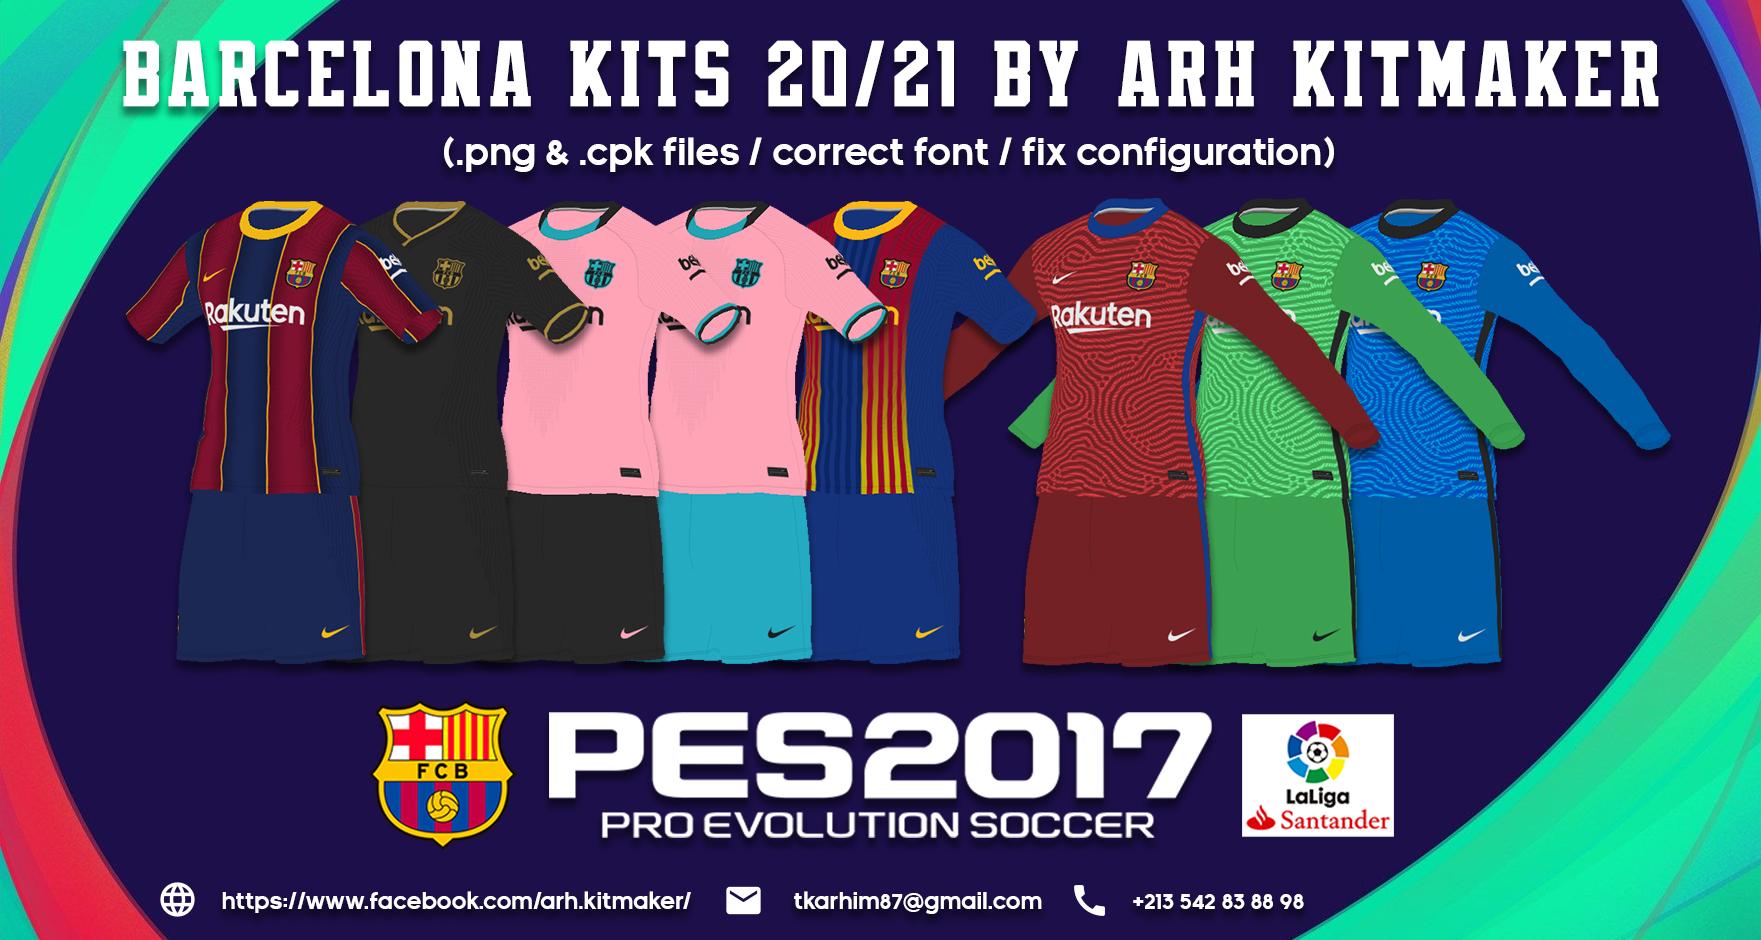 Mundo Kits Ps4 Barcelona Pes 2017 Kits Archives Pes